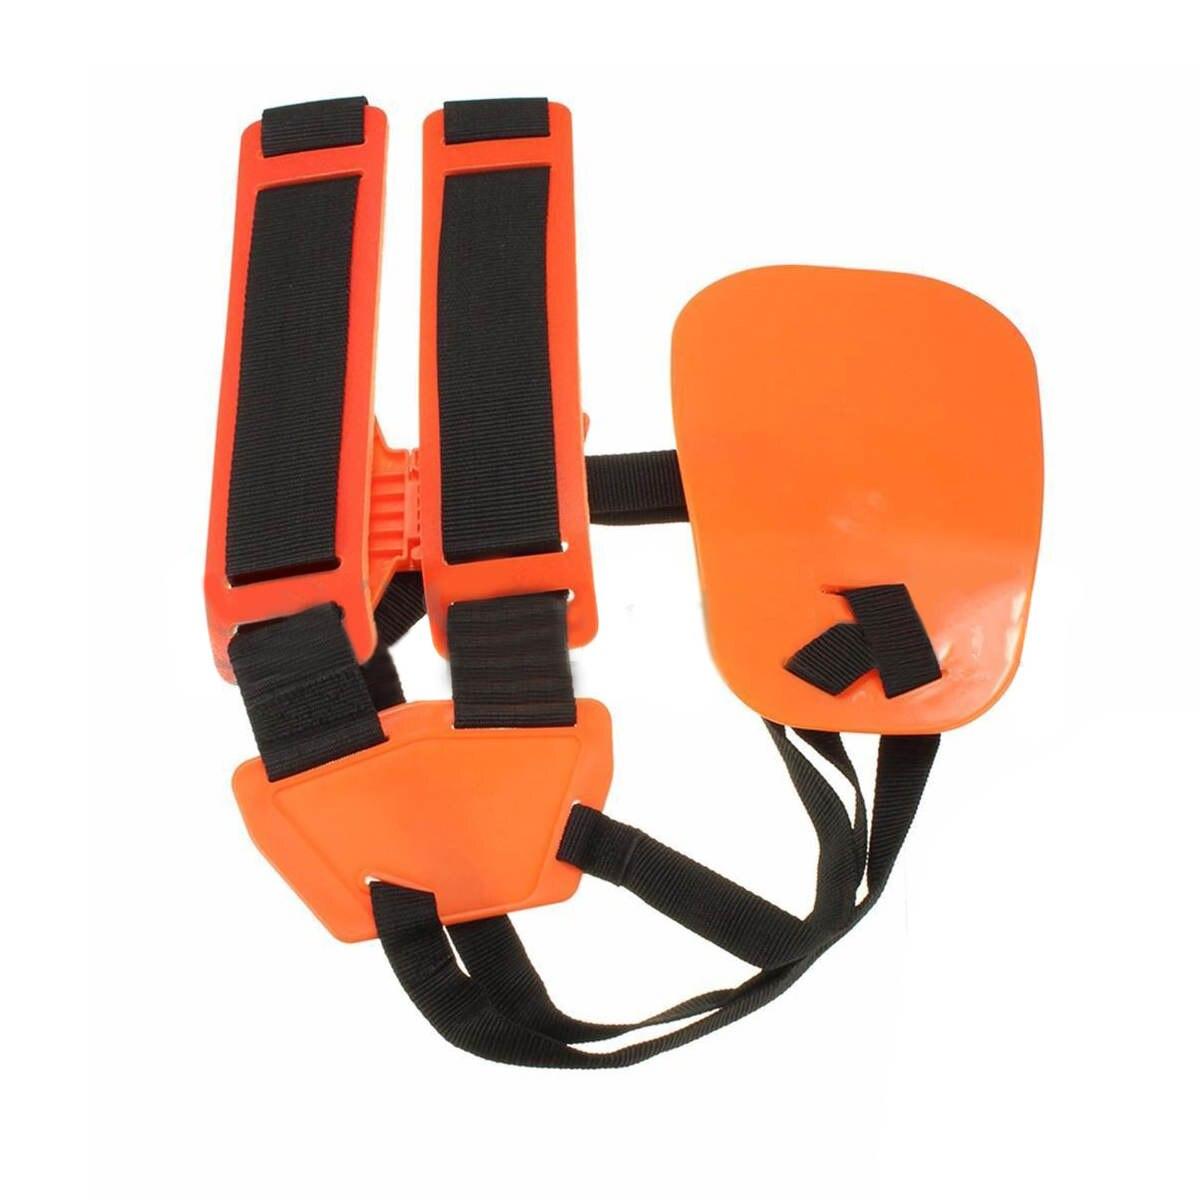 2017 Safe Double Shoulder Strap Harness Net Bag For Brush Cutter Grass Trimmer Mayitr Lawn Mower Parts Garden Tools Orange&Black  цены